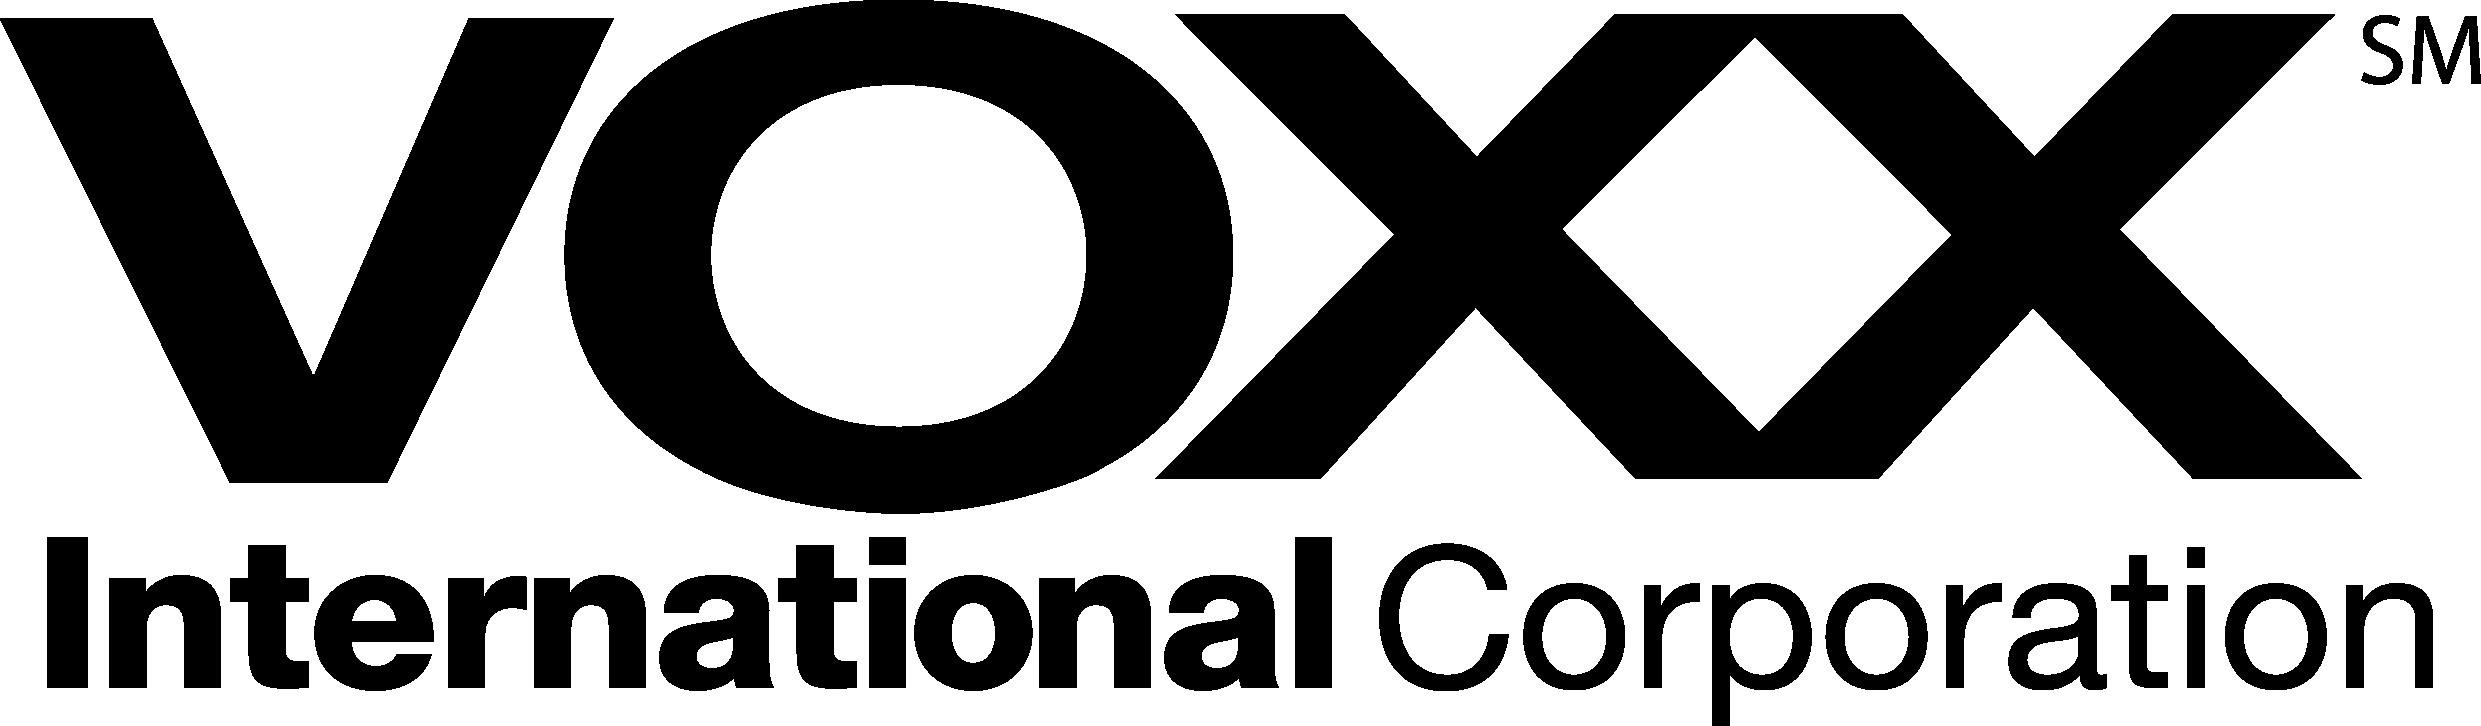 VoxxIntl_Logo-text_Black (002).png